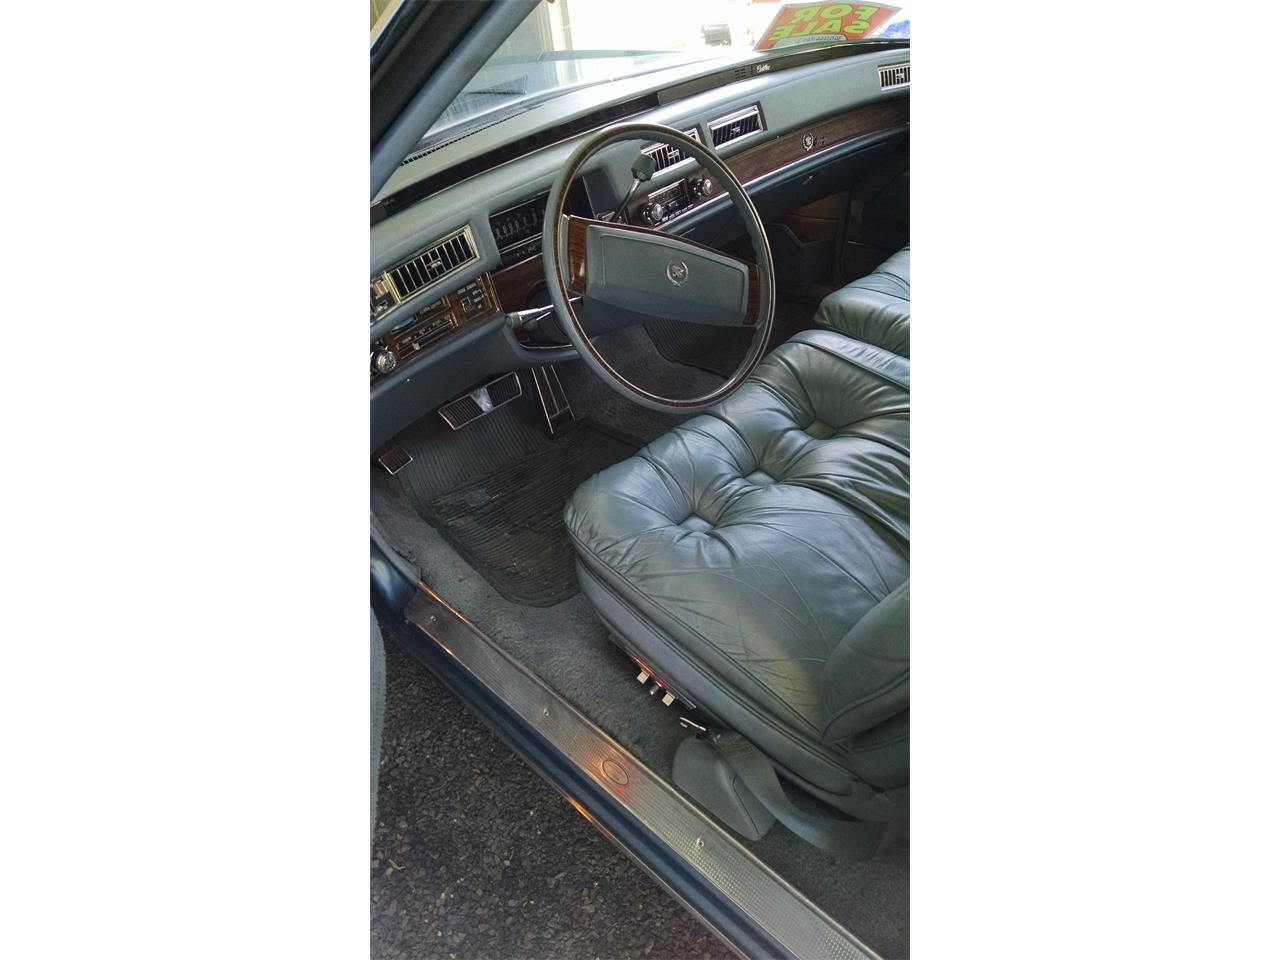 1978 Cadillac Eldorado Biarritz (CC-1073627) for sale in Winlock, Washington